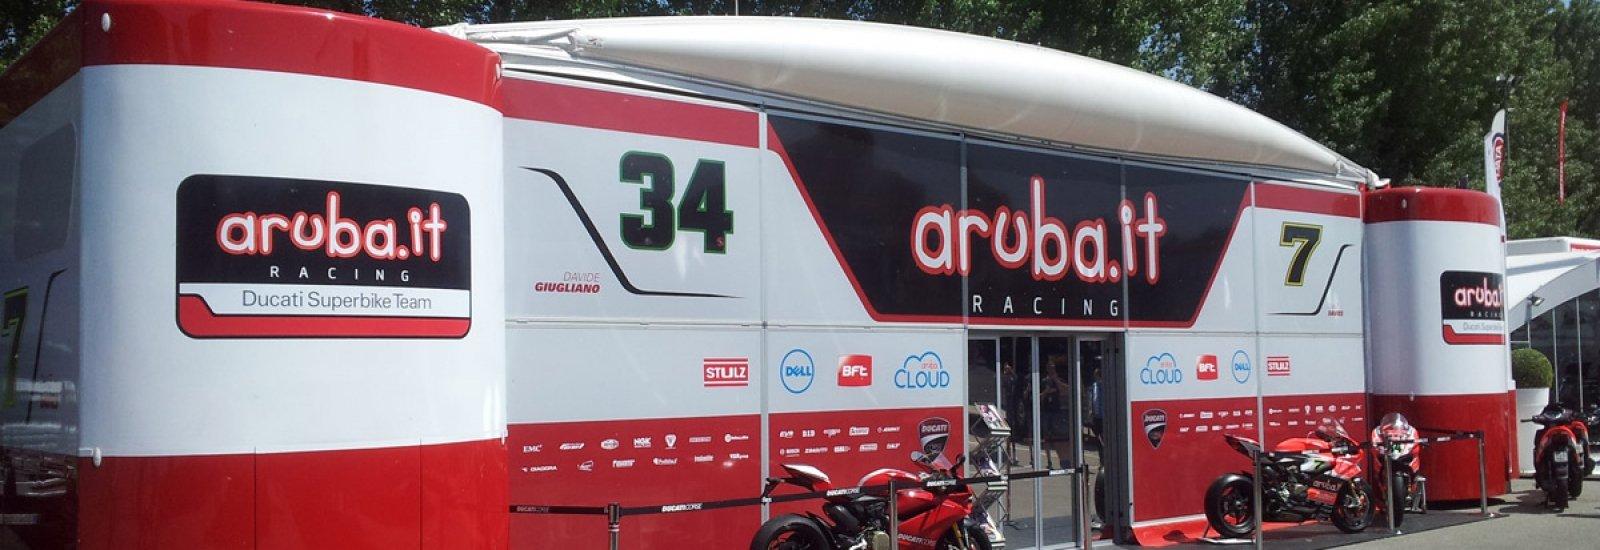 Hospitality Ducati Superbike con tetto Tensairity